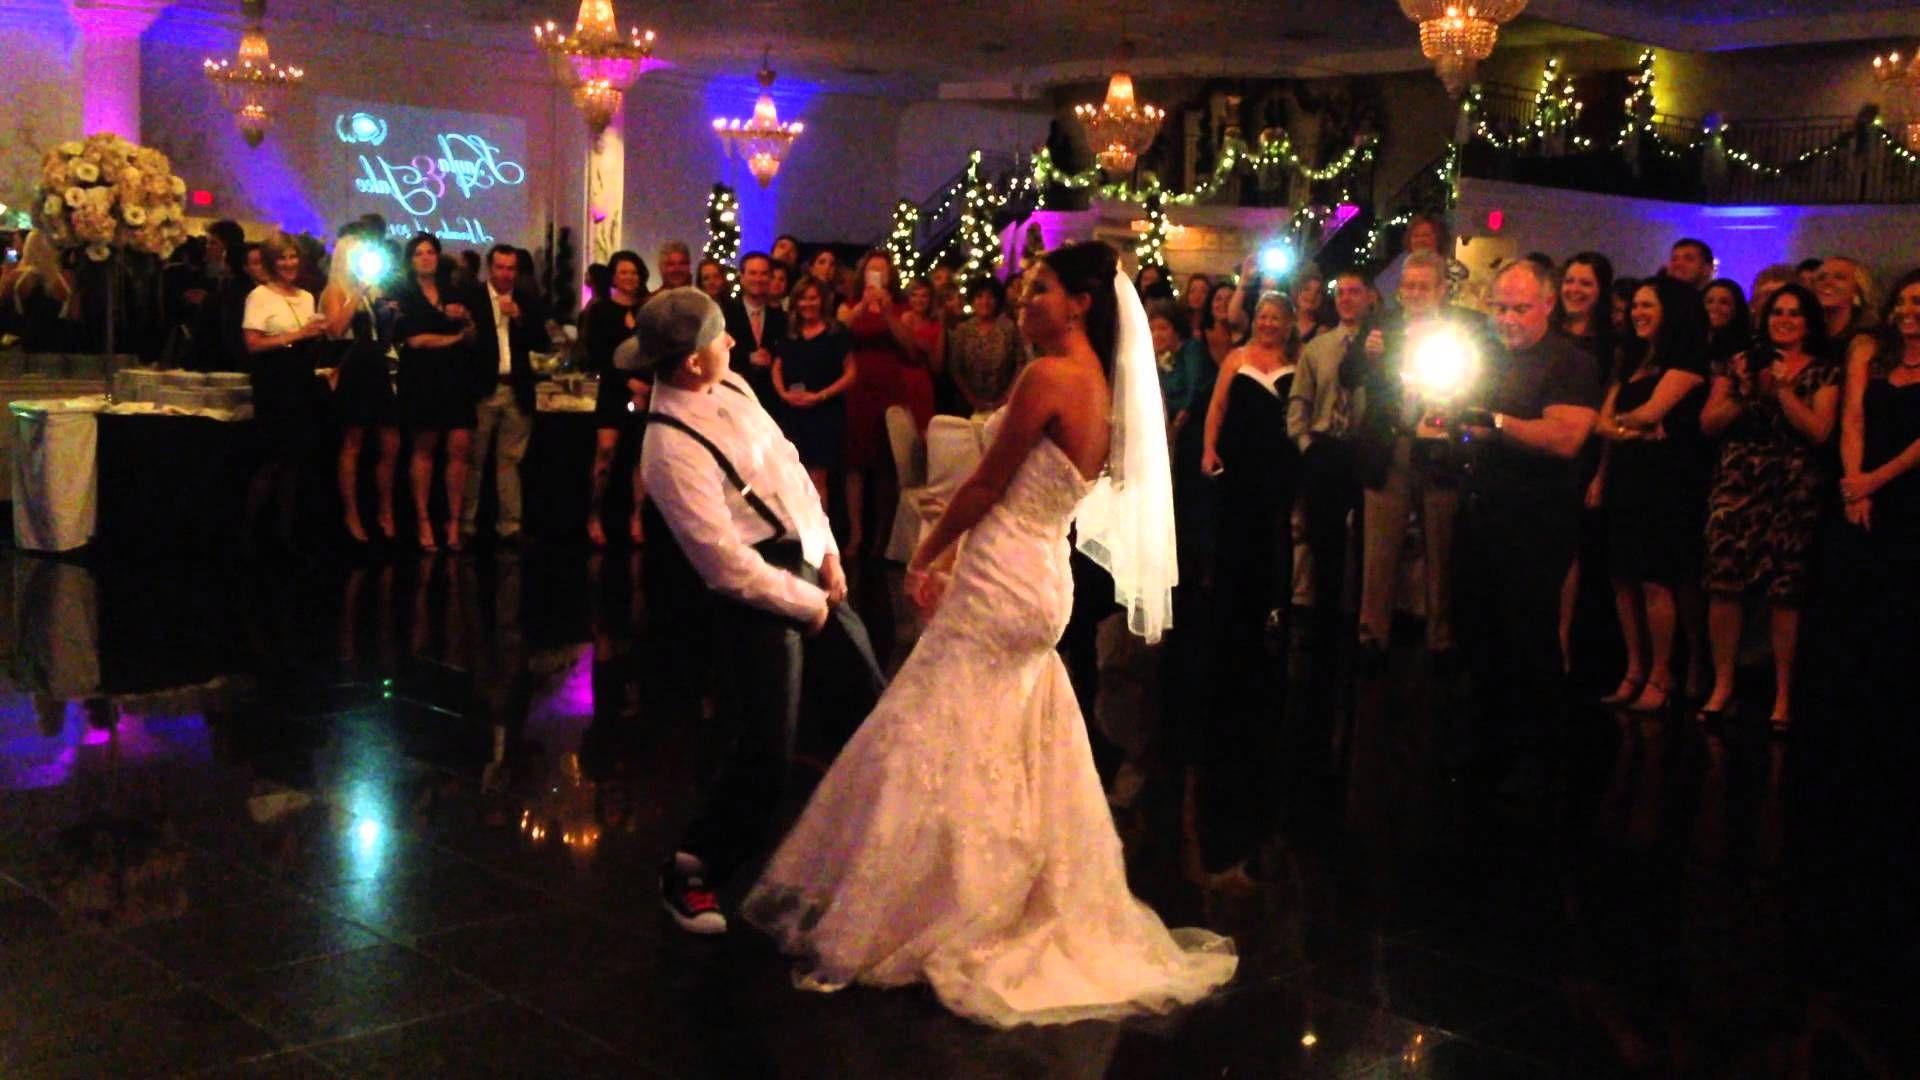 BEST SURPRISE HIP HOP WEDDING FIRST DANCE EVER BRUNO MARS